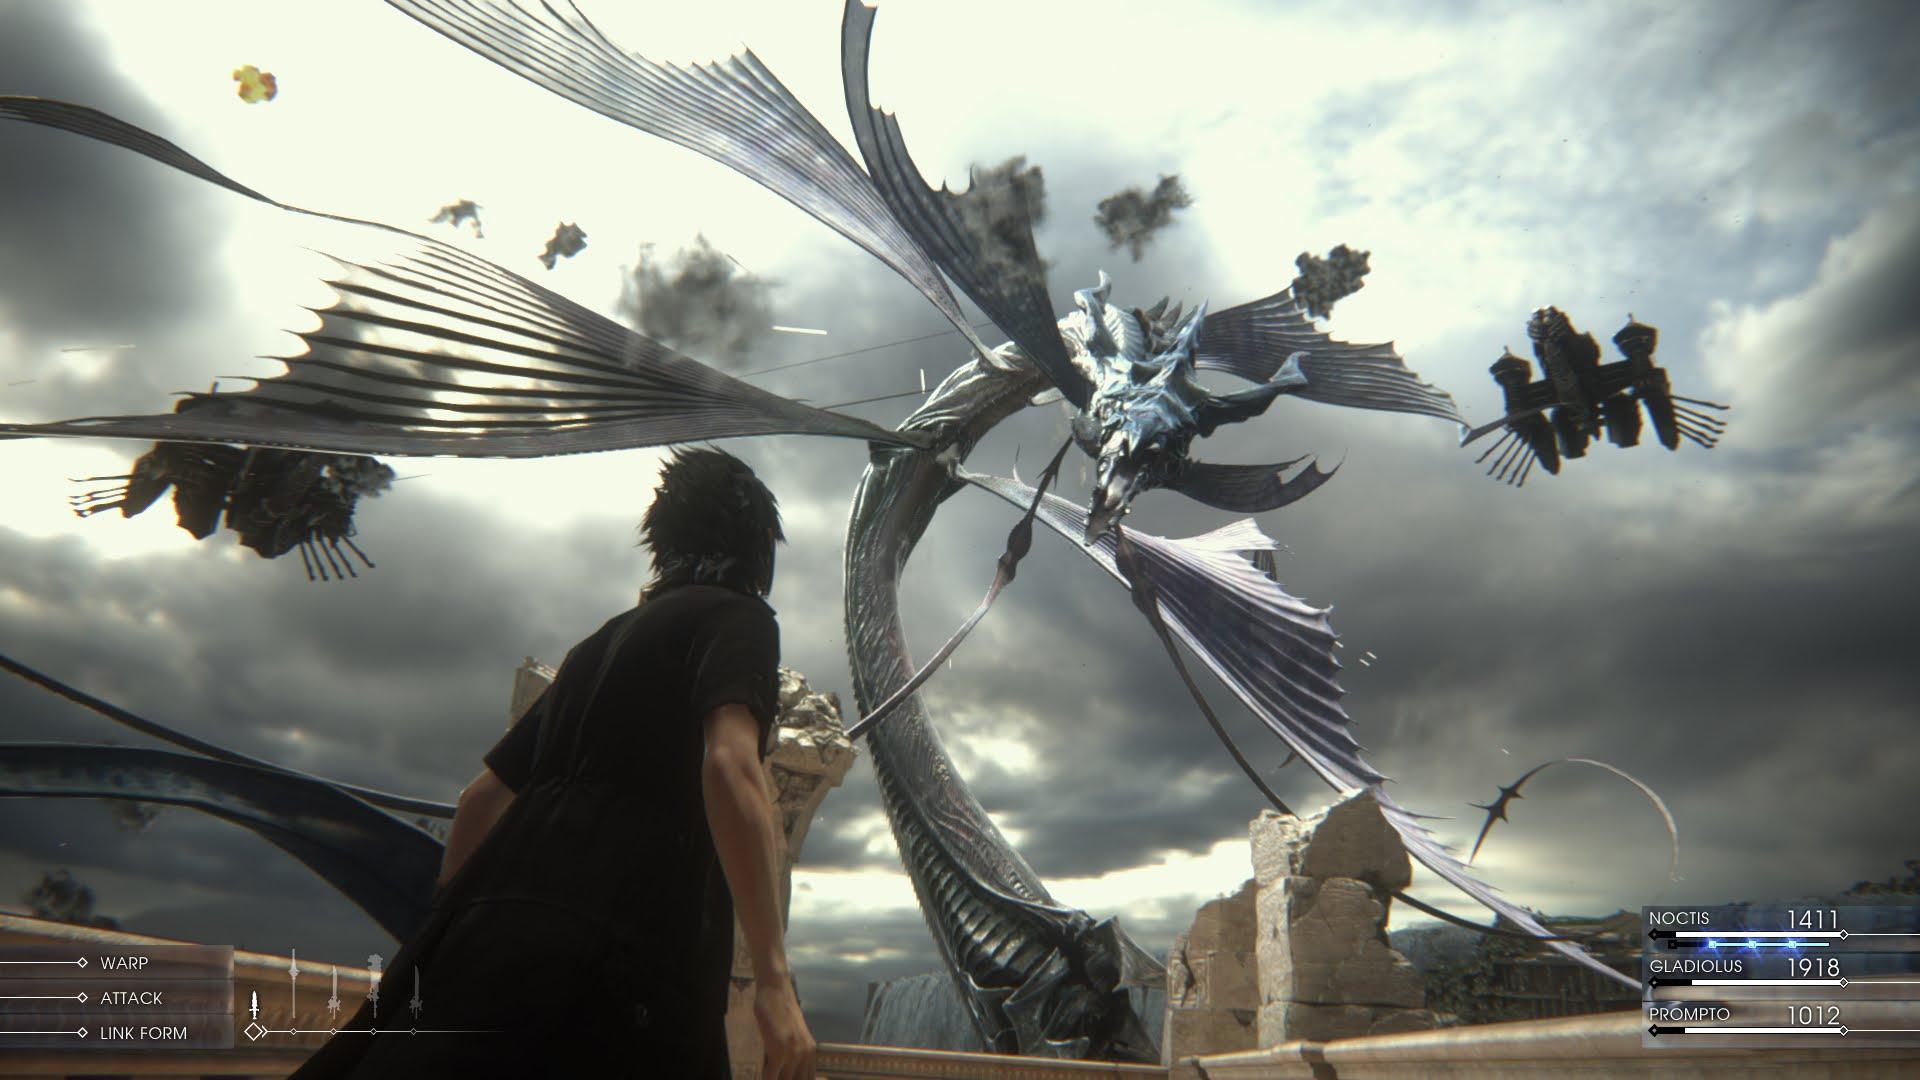 Image de Final Fantasy XV avec le Leviathan